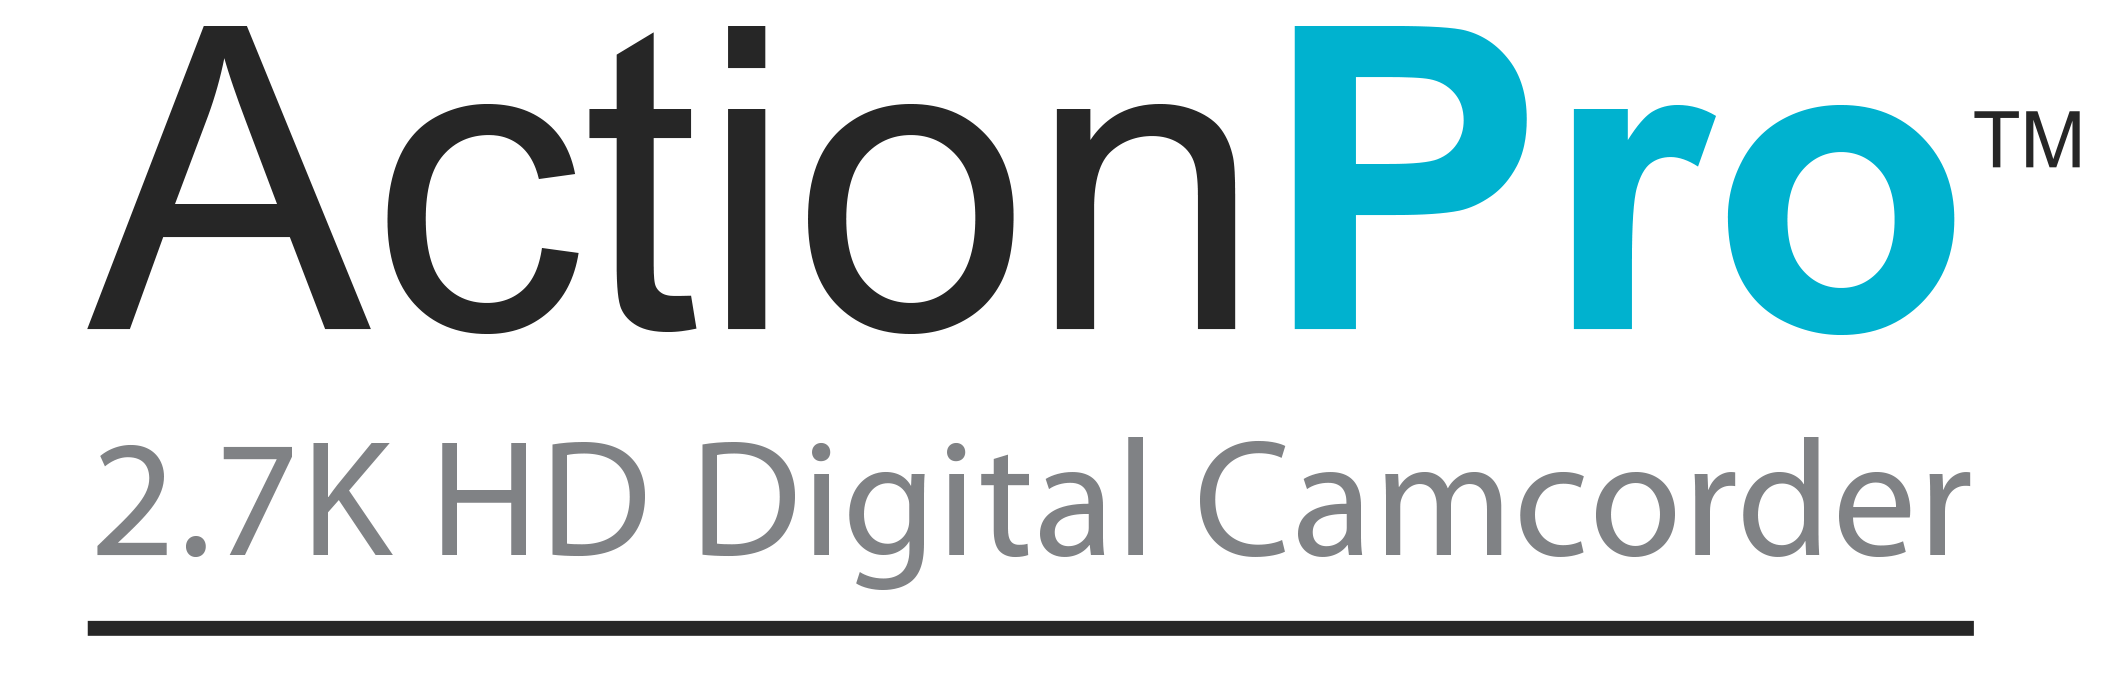 actionpro-logo.png